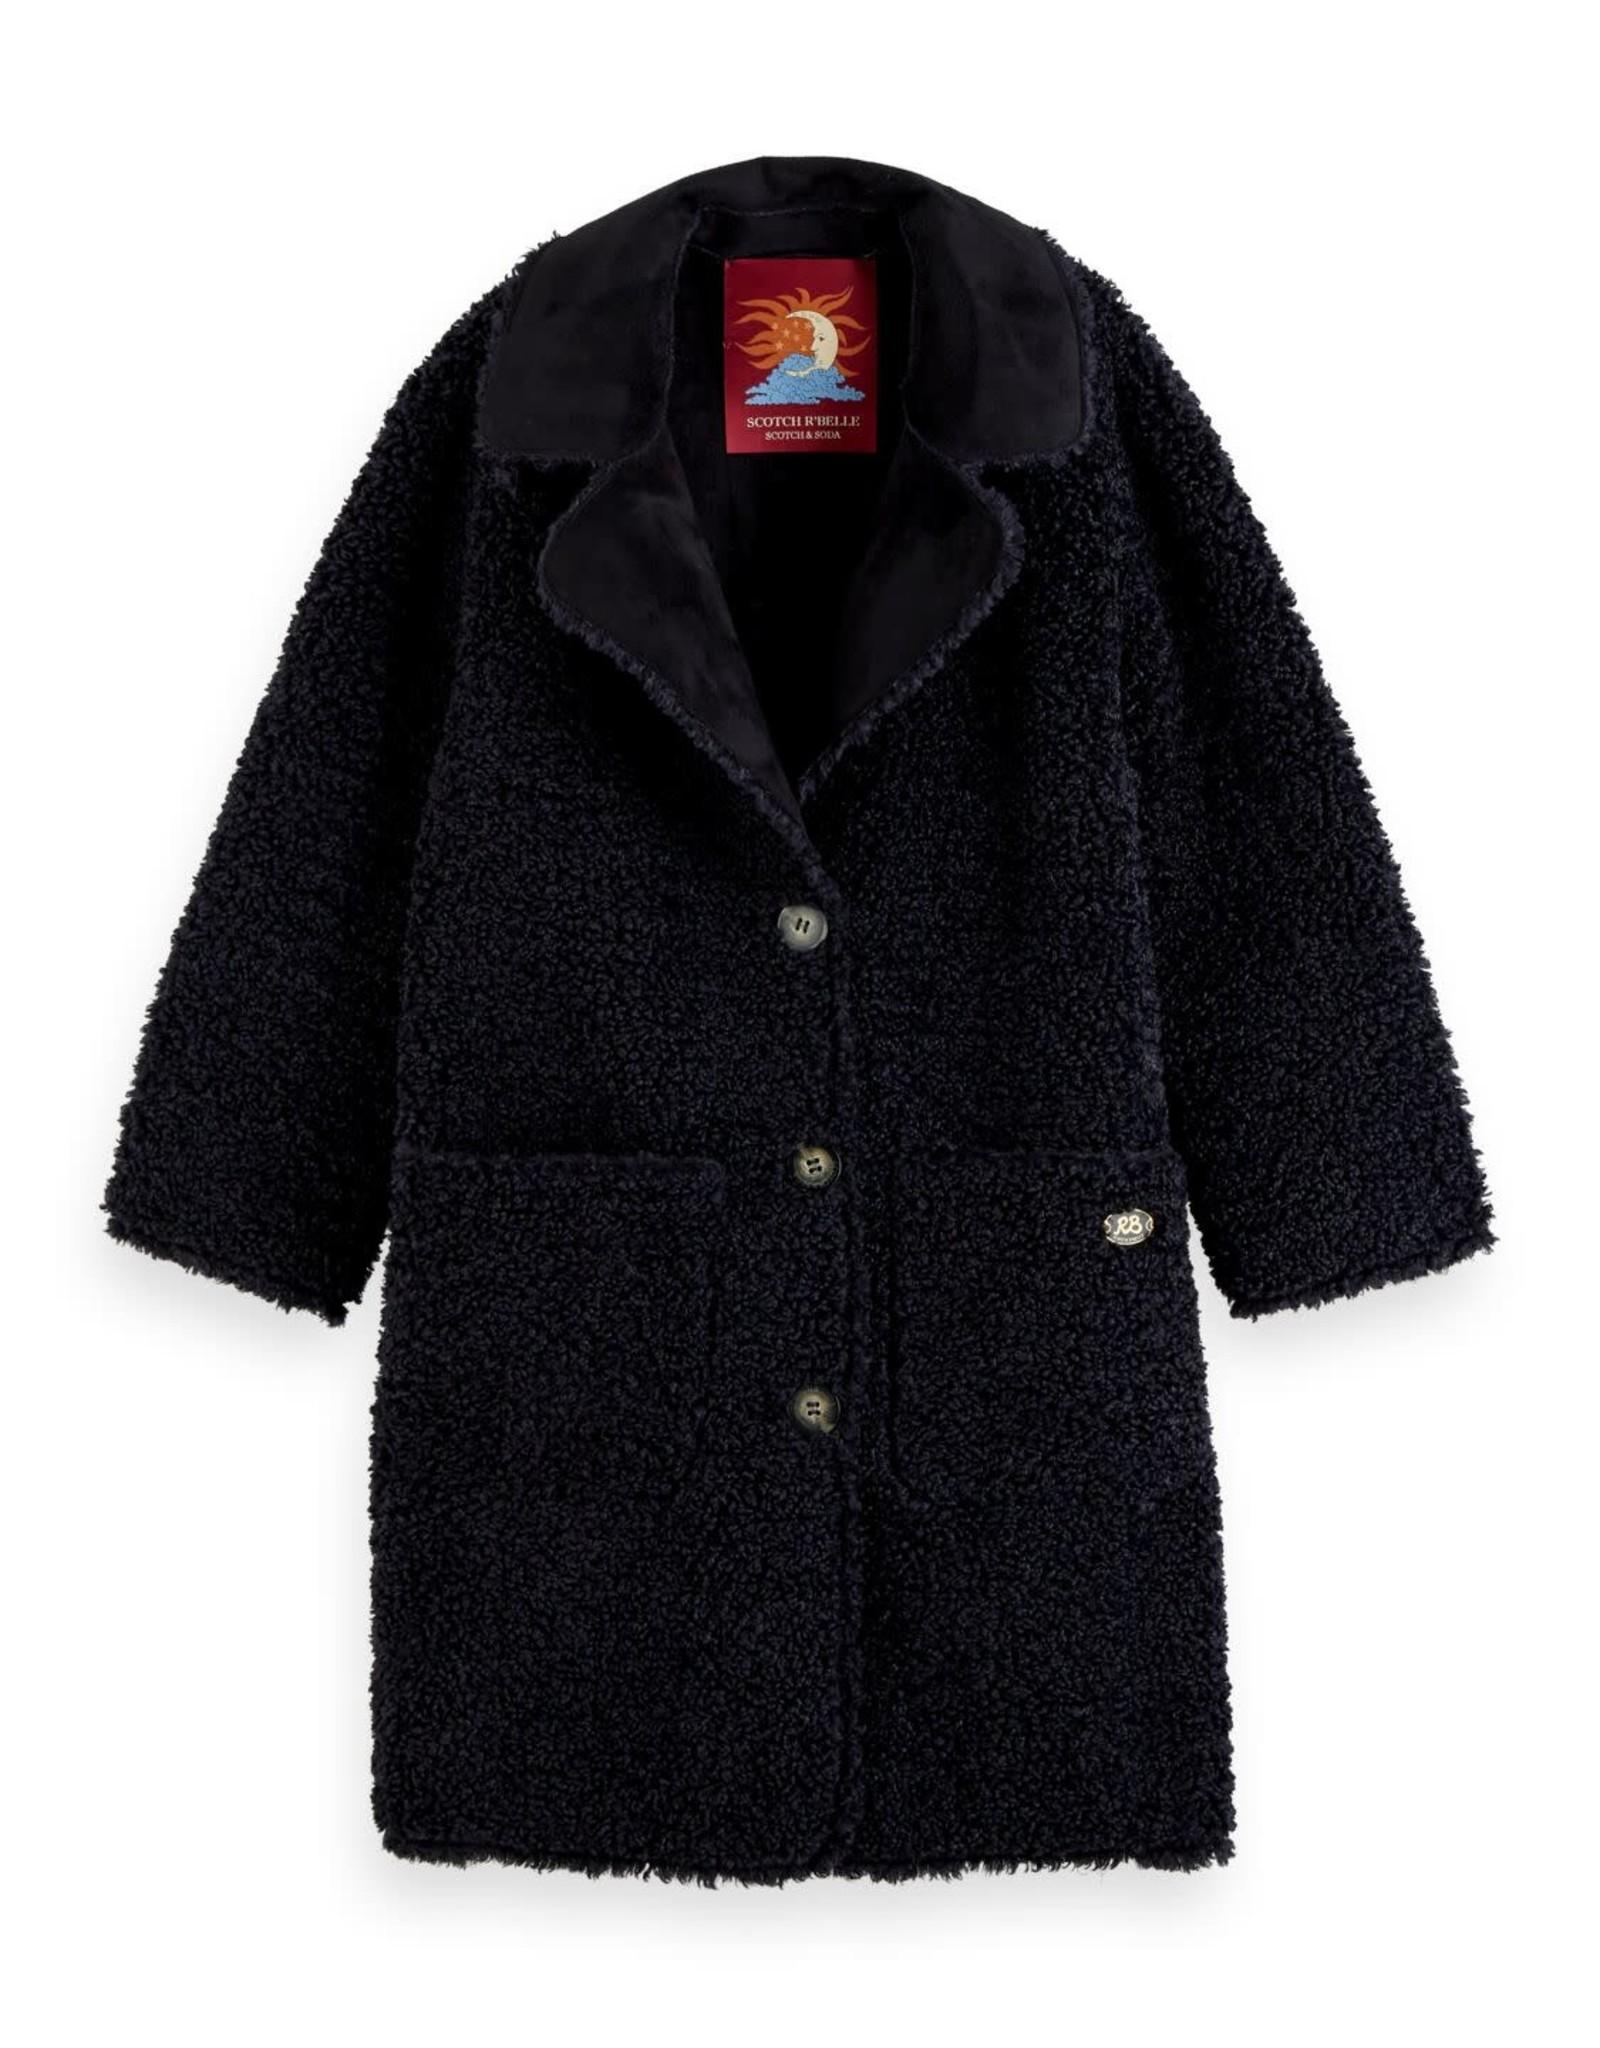 SCOTCH REBELLE Reversible teddy jacket 0002-Night